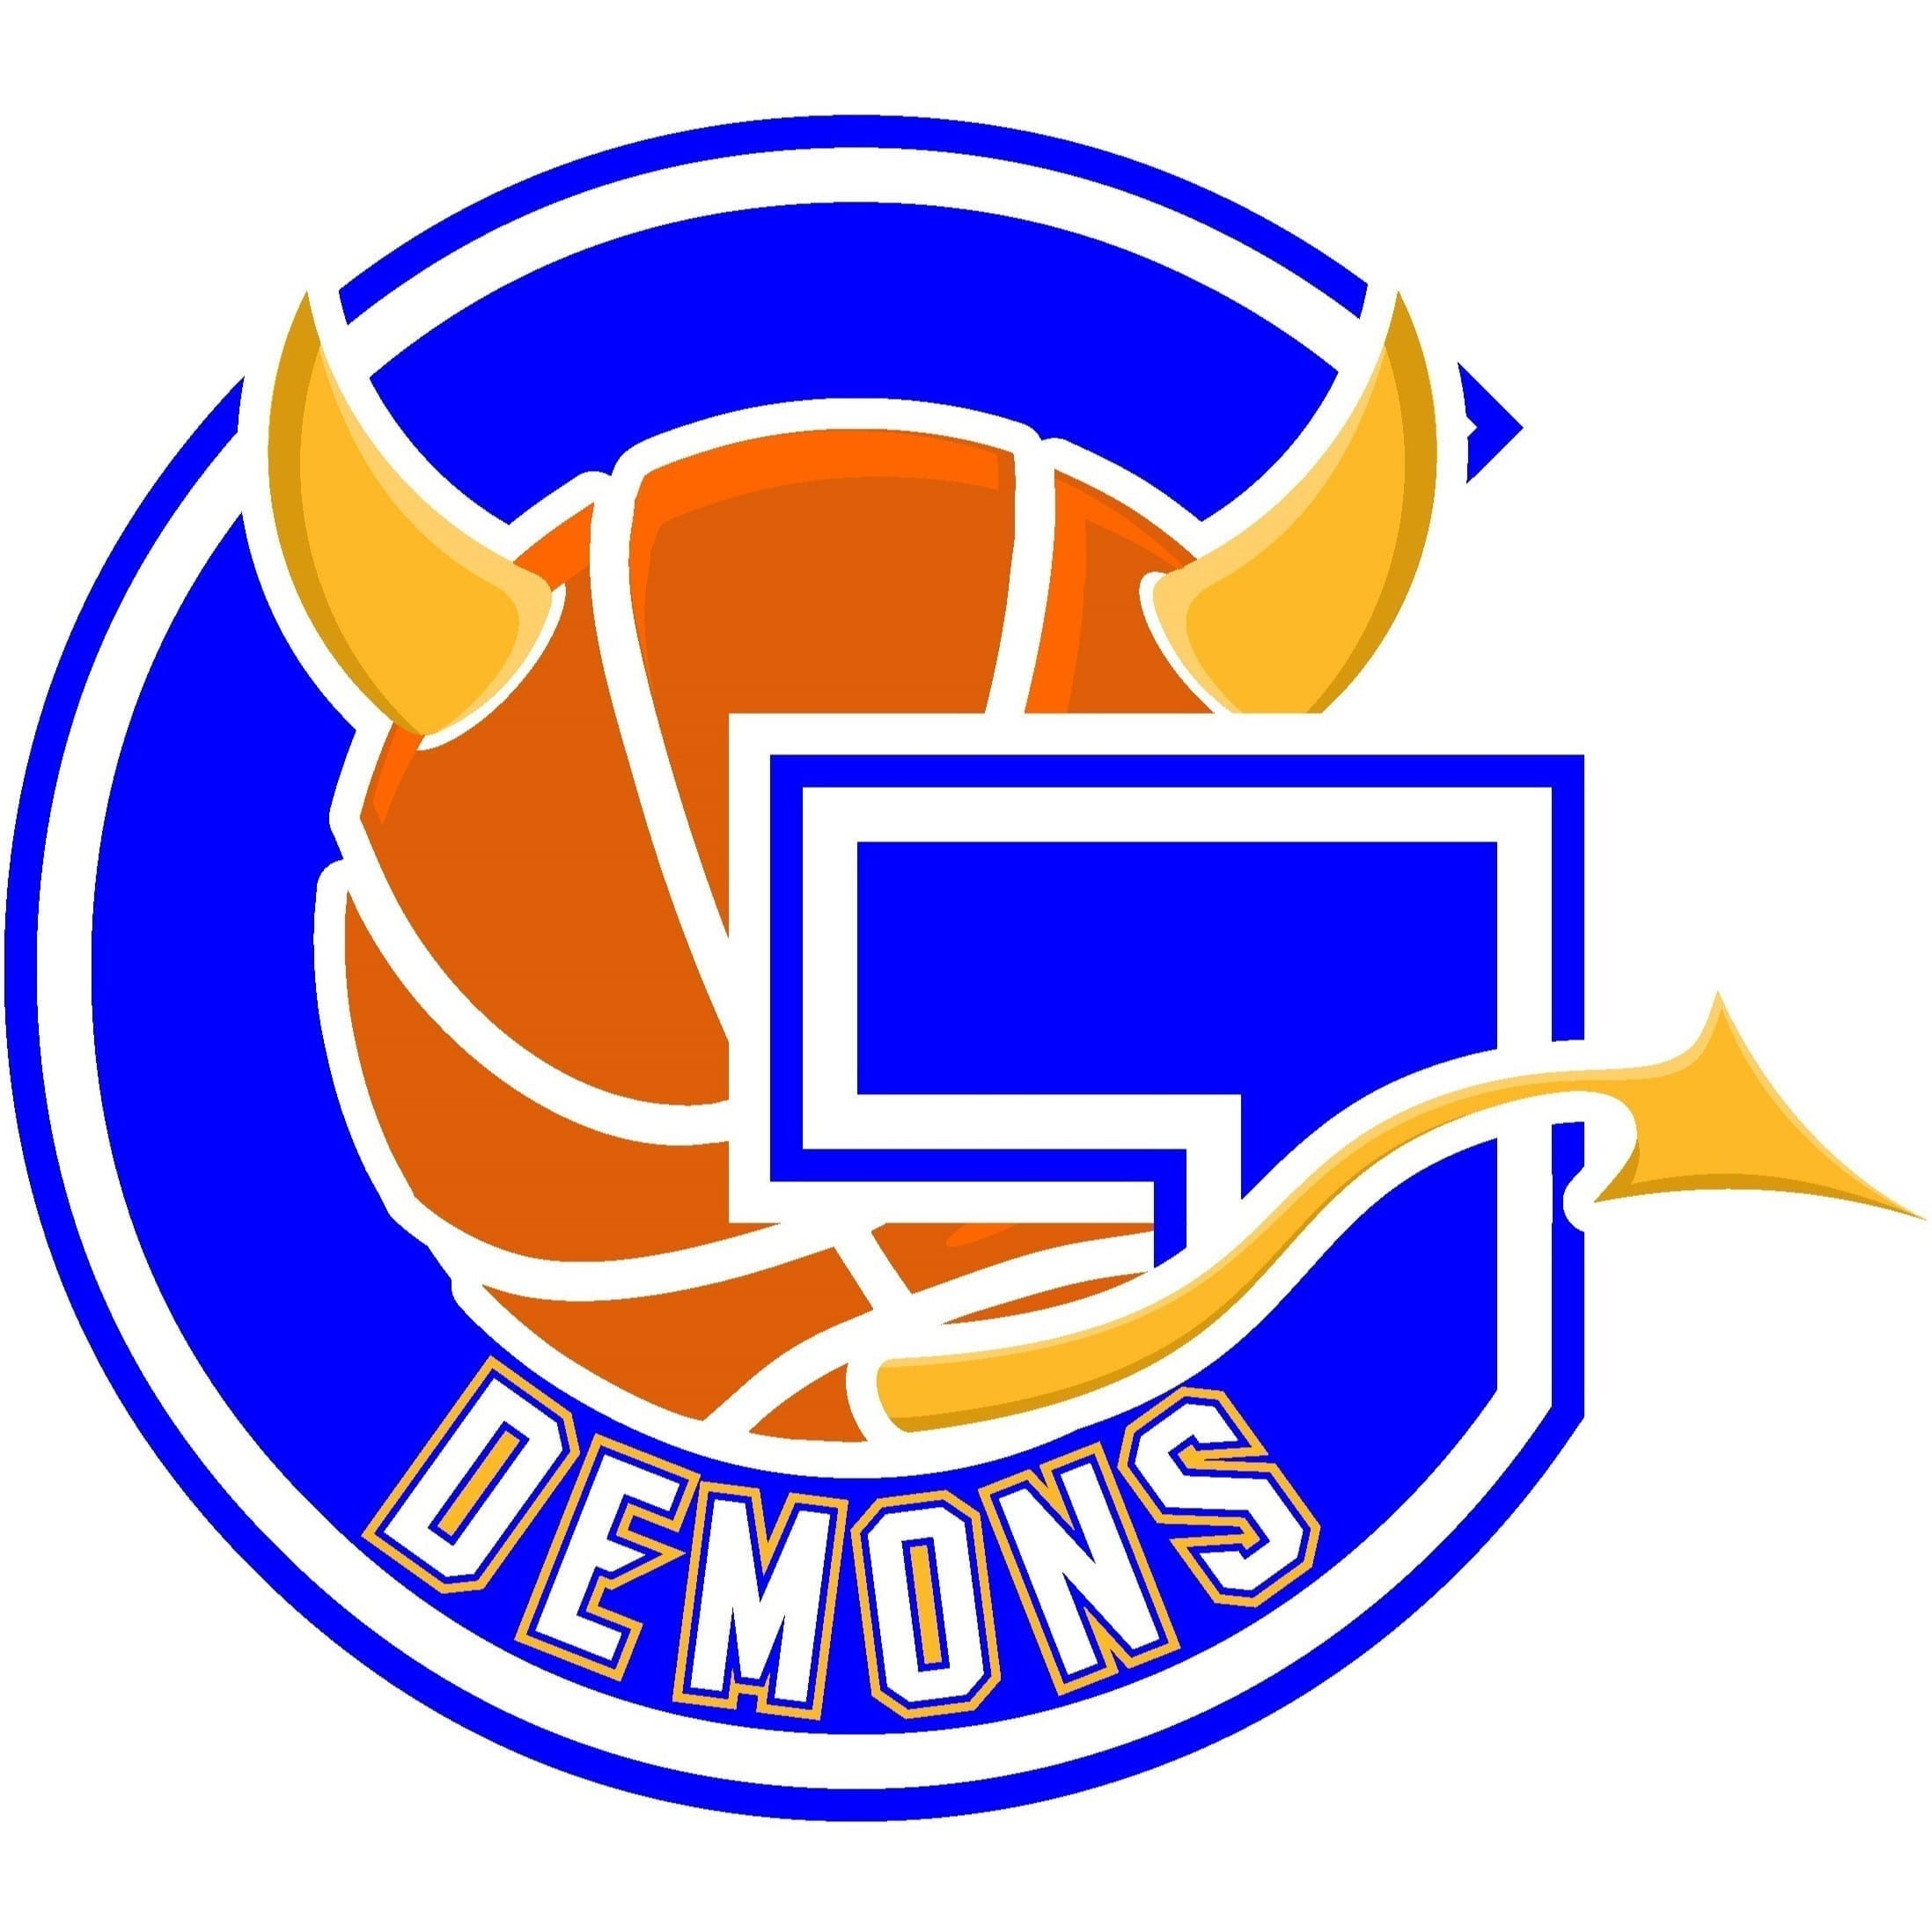 Gurnee Demons